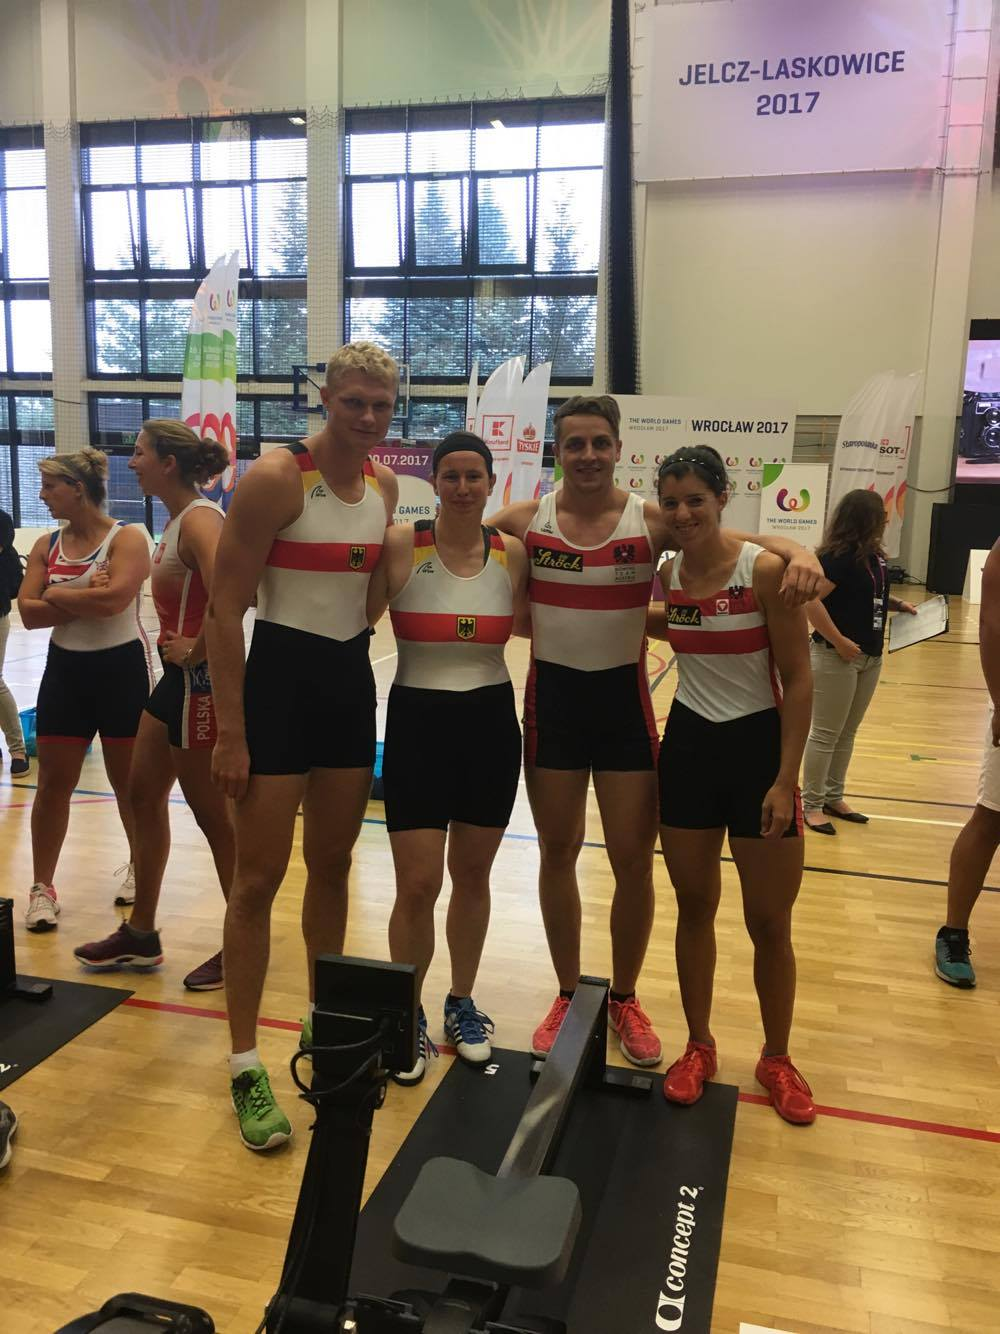 Mixed-Staffel, World Games 2017, Breslau